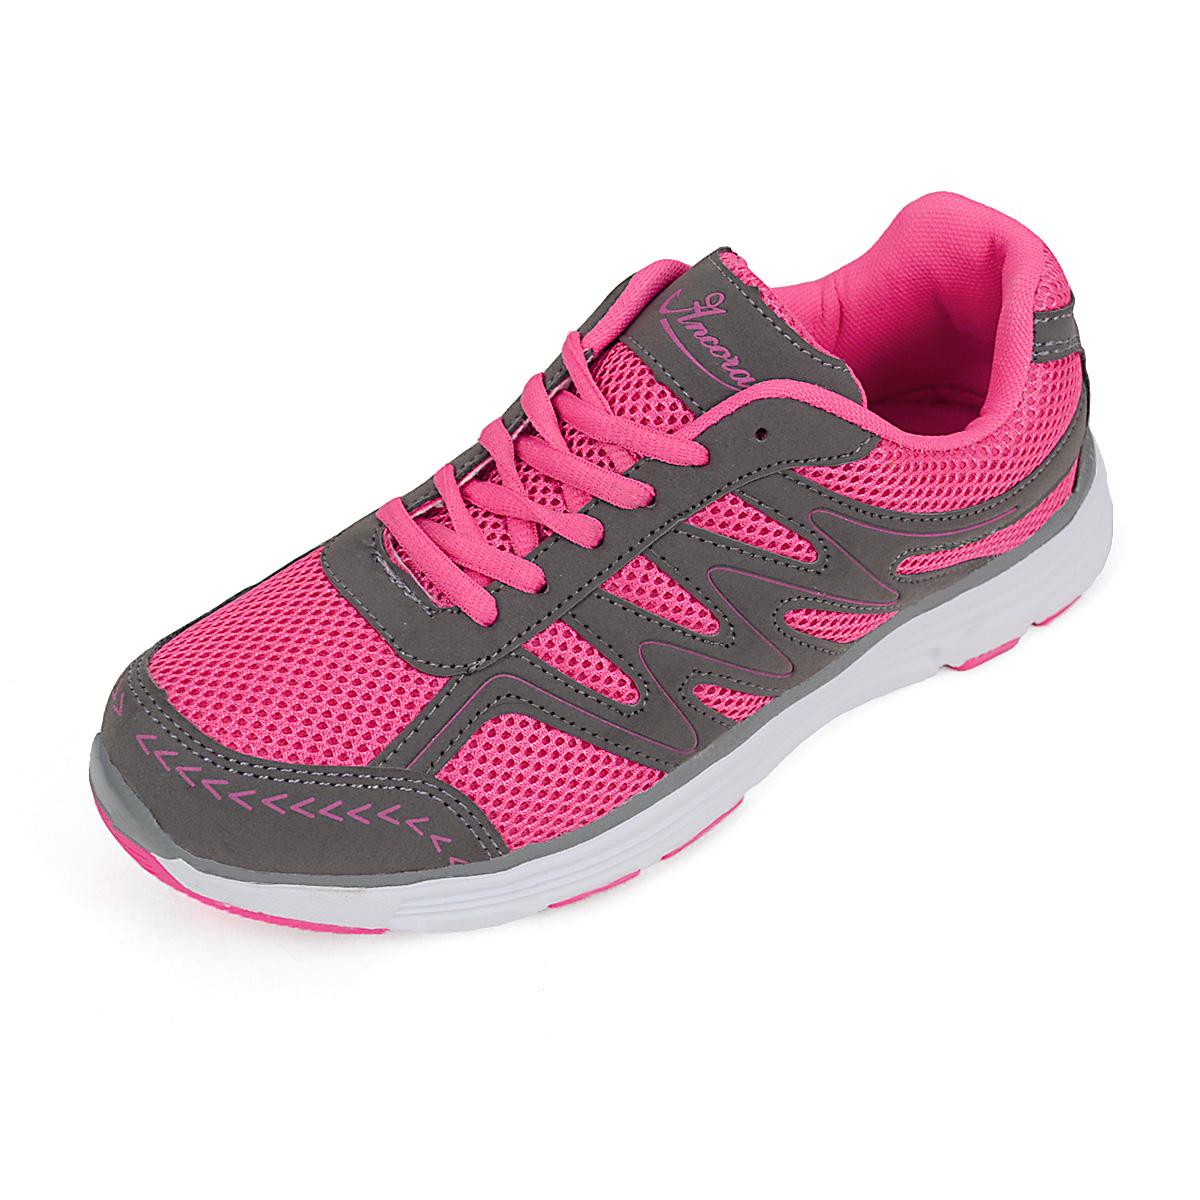 12pcs Women's Pink Sport SNEAKERS Shoes SPLC015L-PK